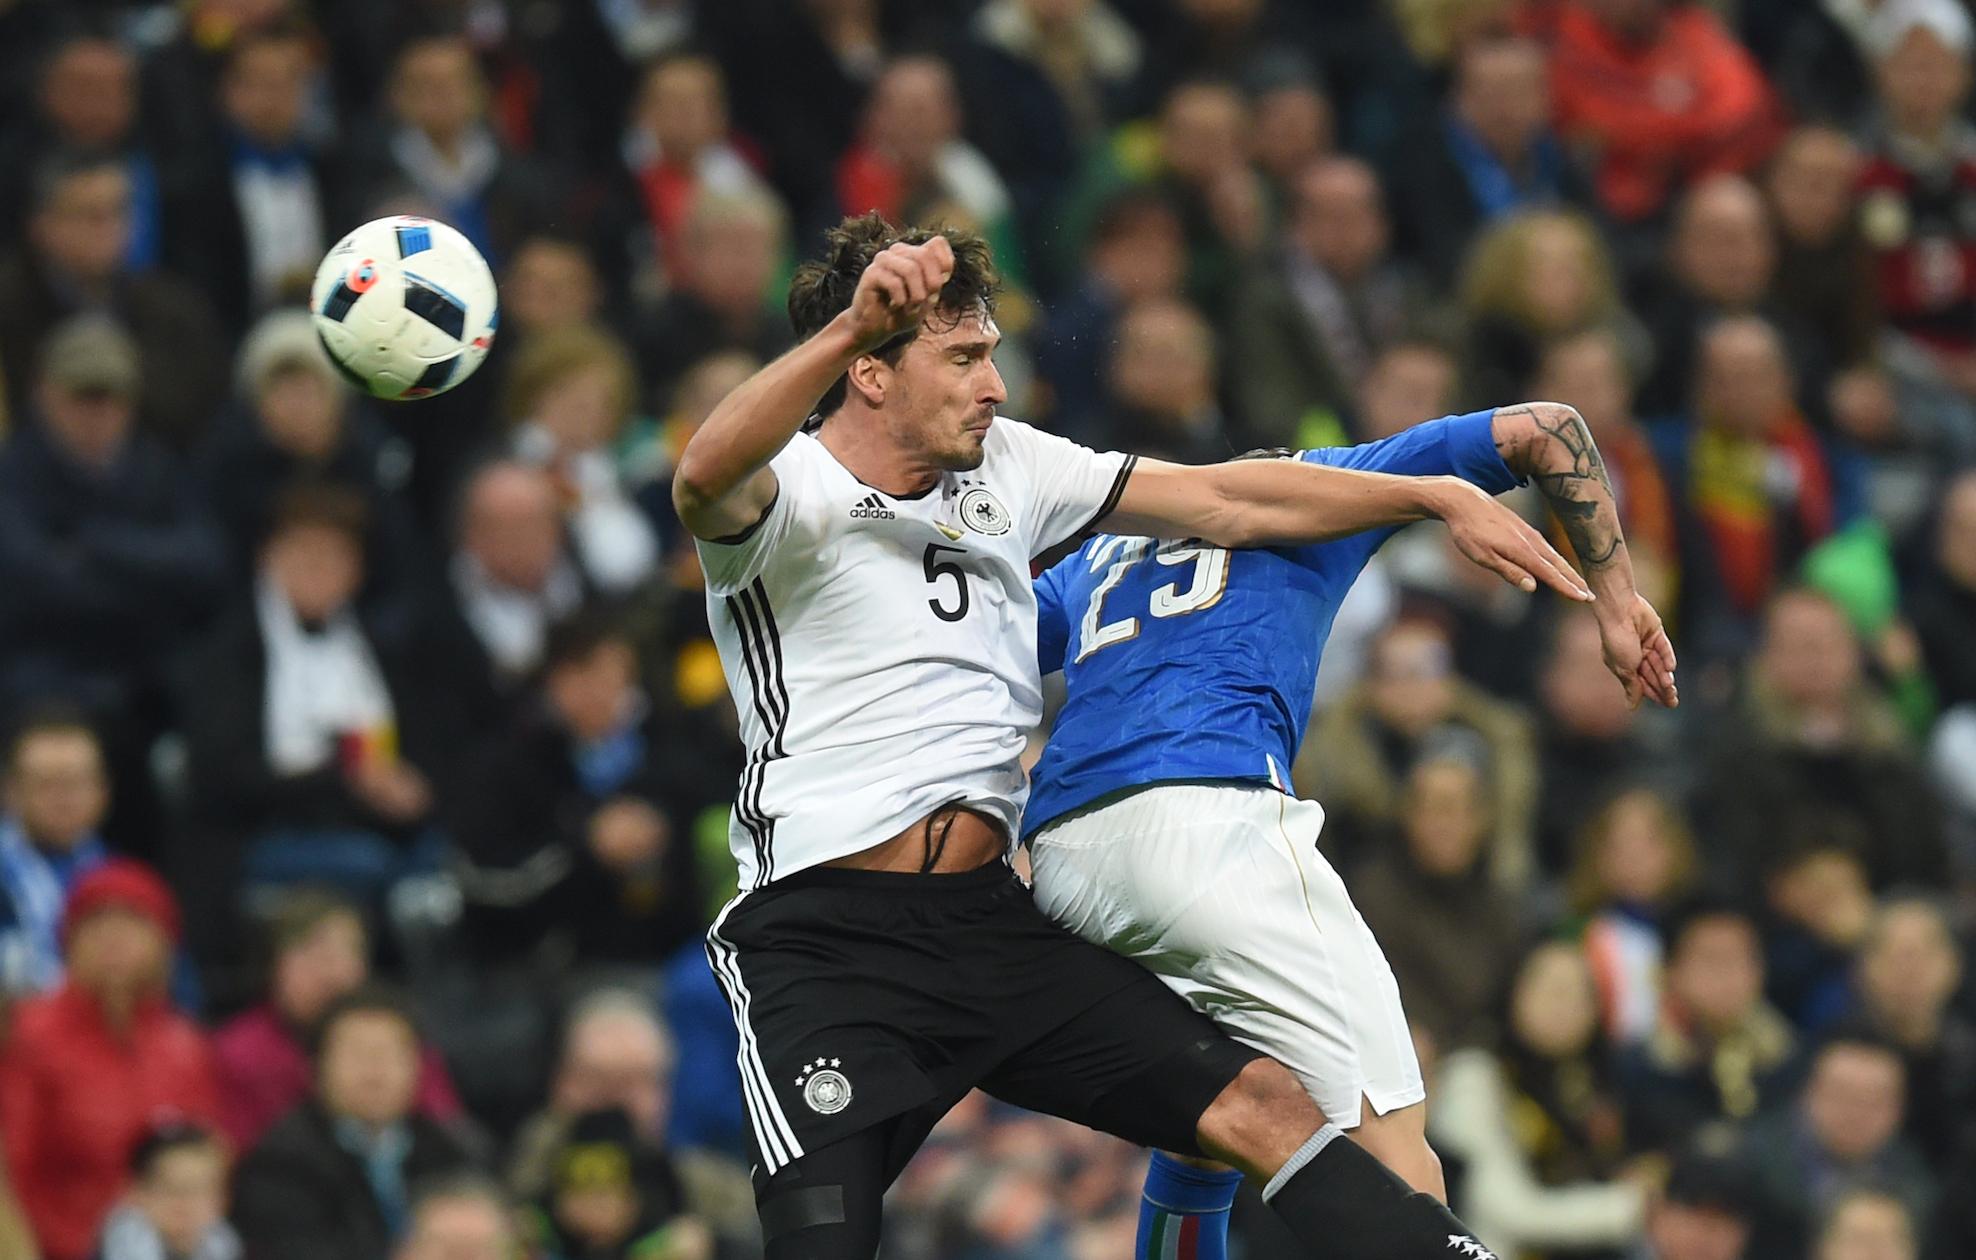 FBL-EURO-2016-FRIENDLY-GER-ITA